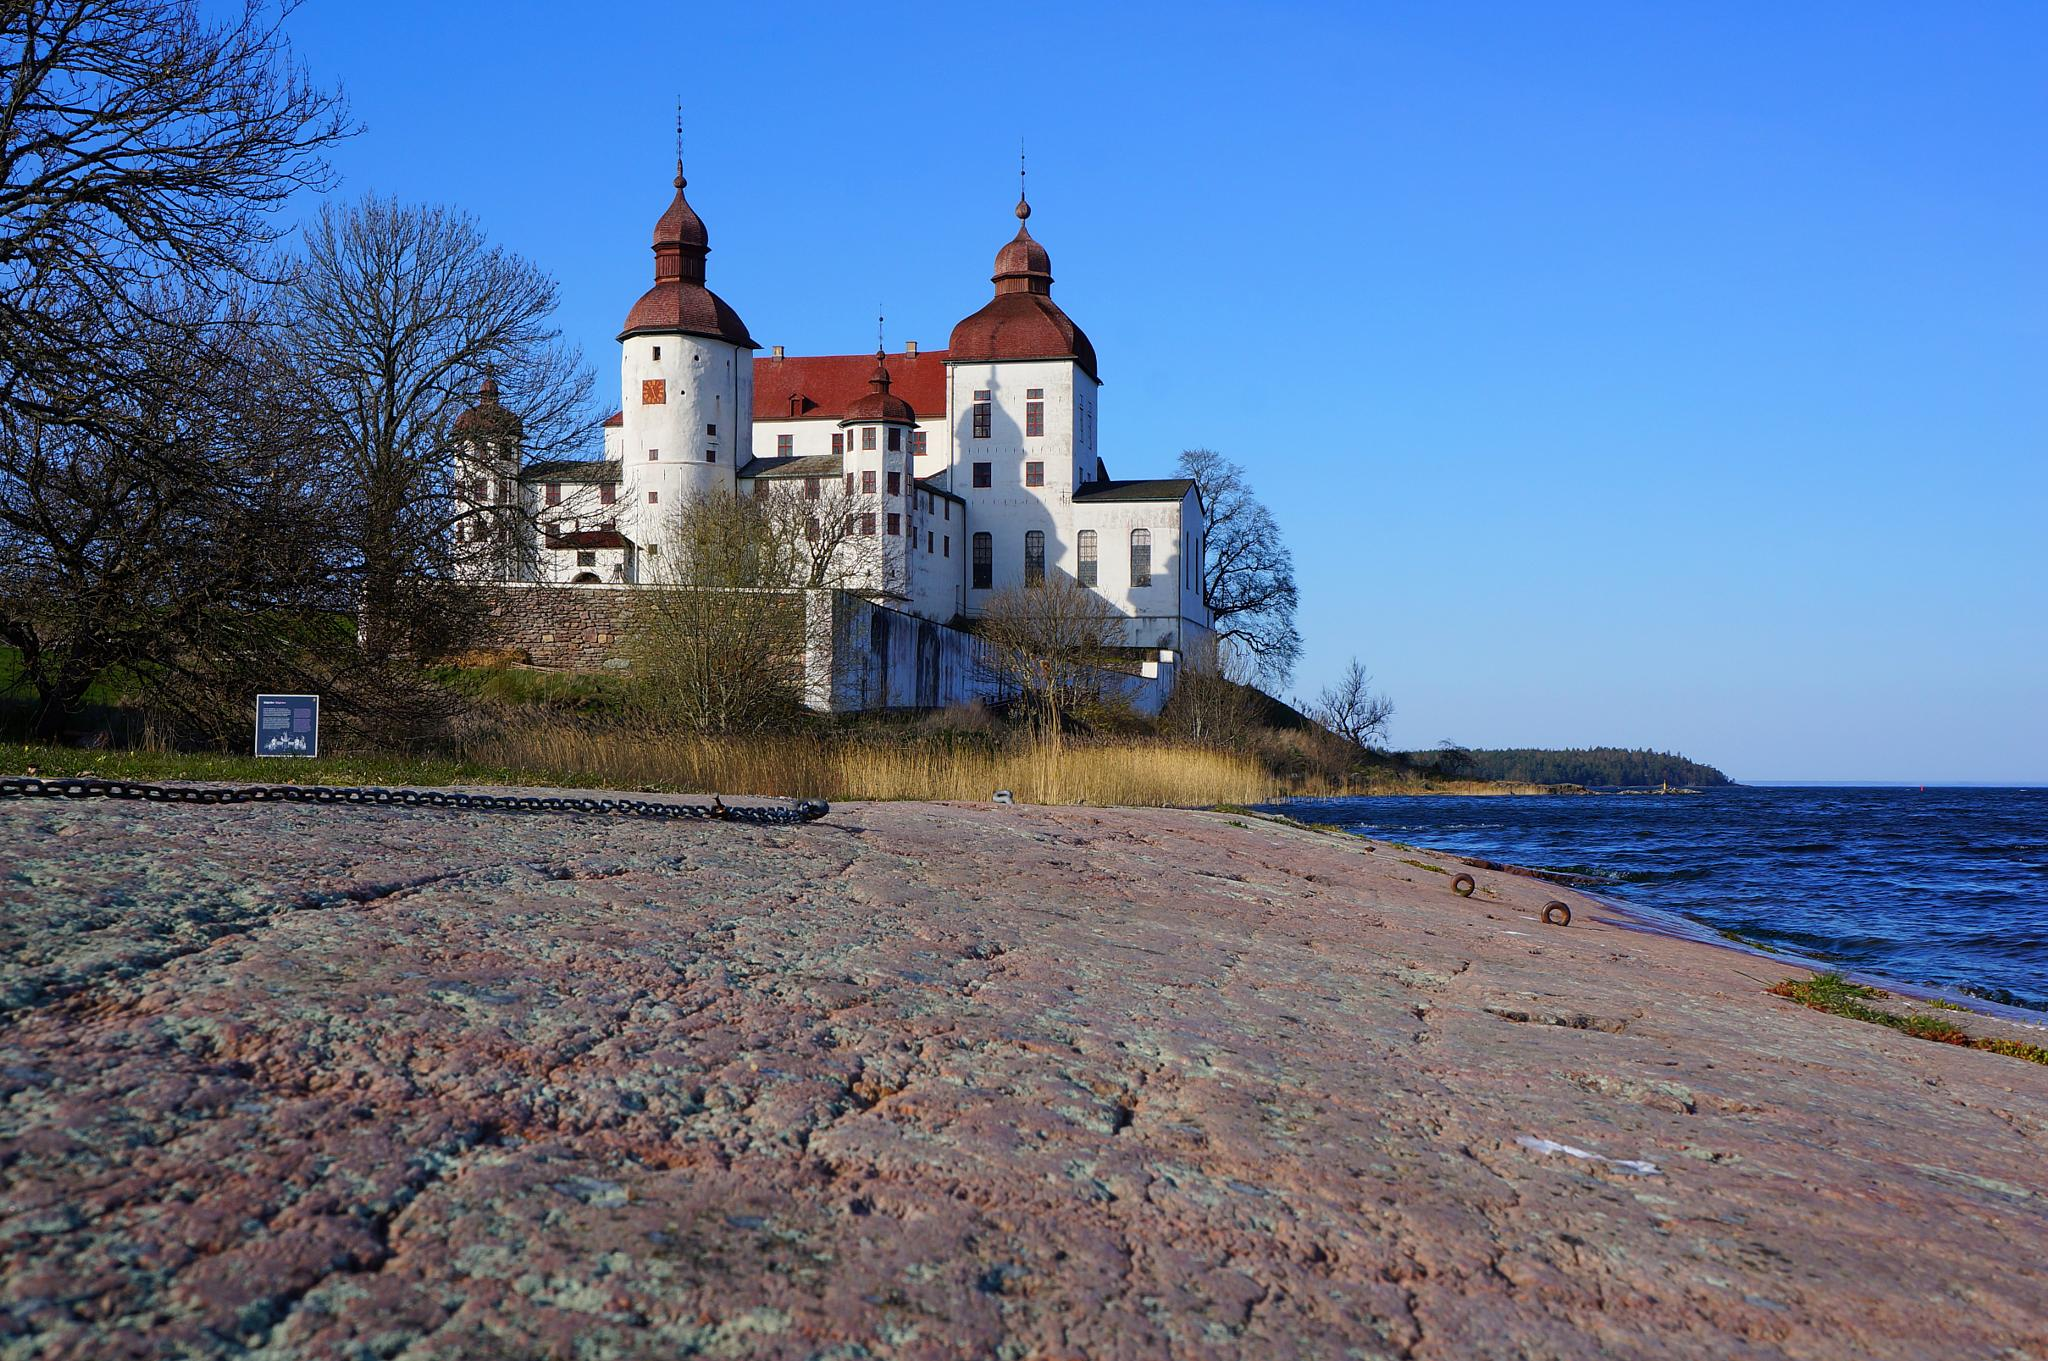 Rock and Castle by Bror Sandås